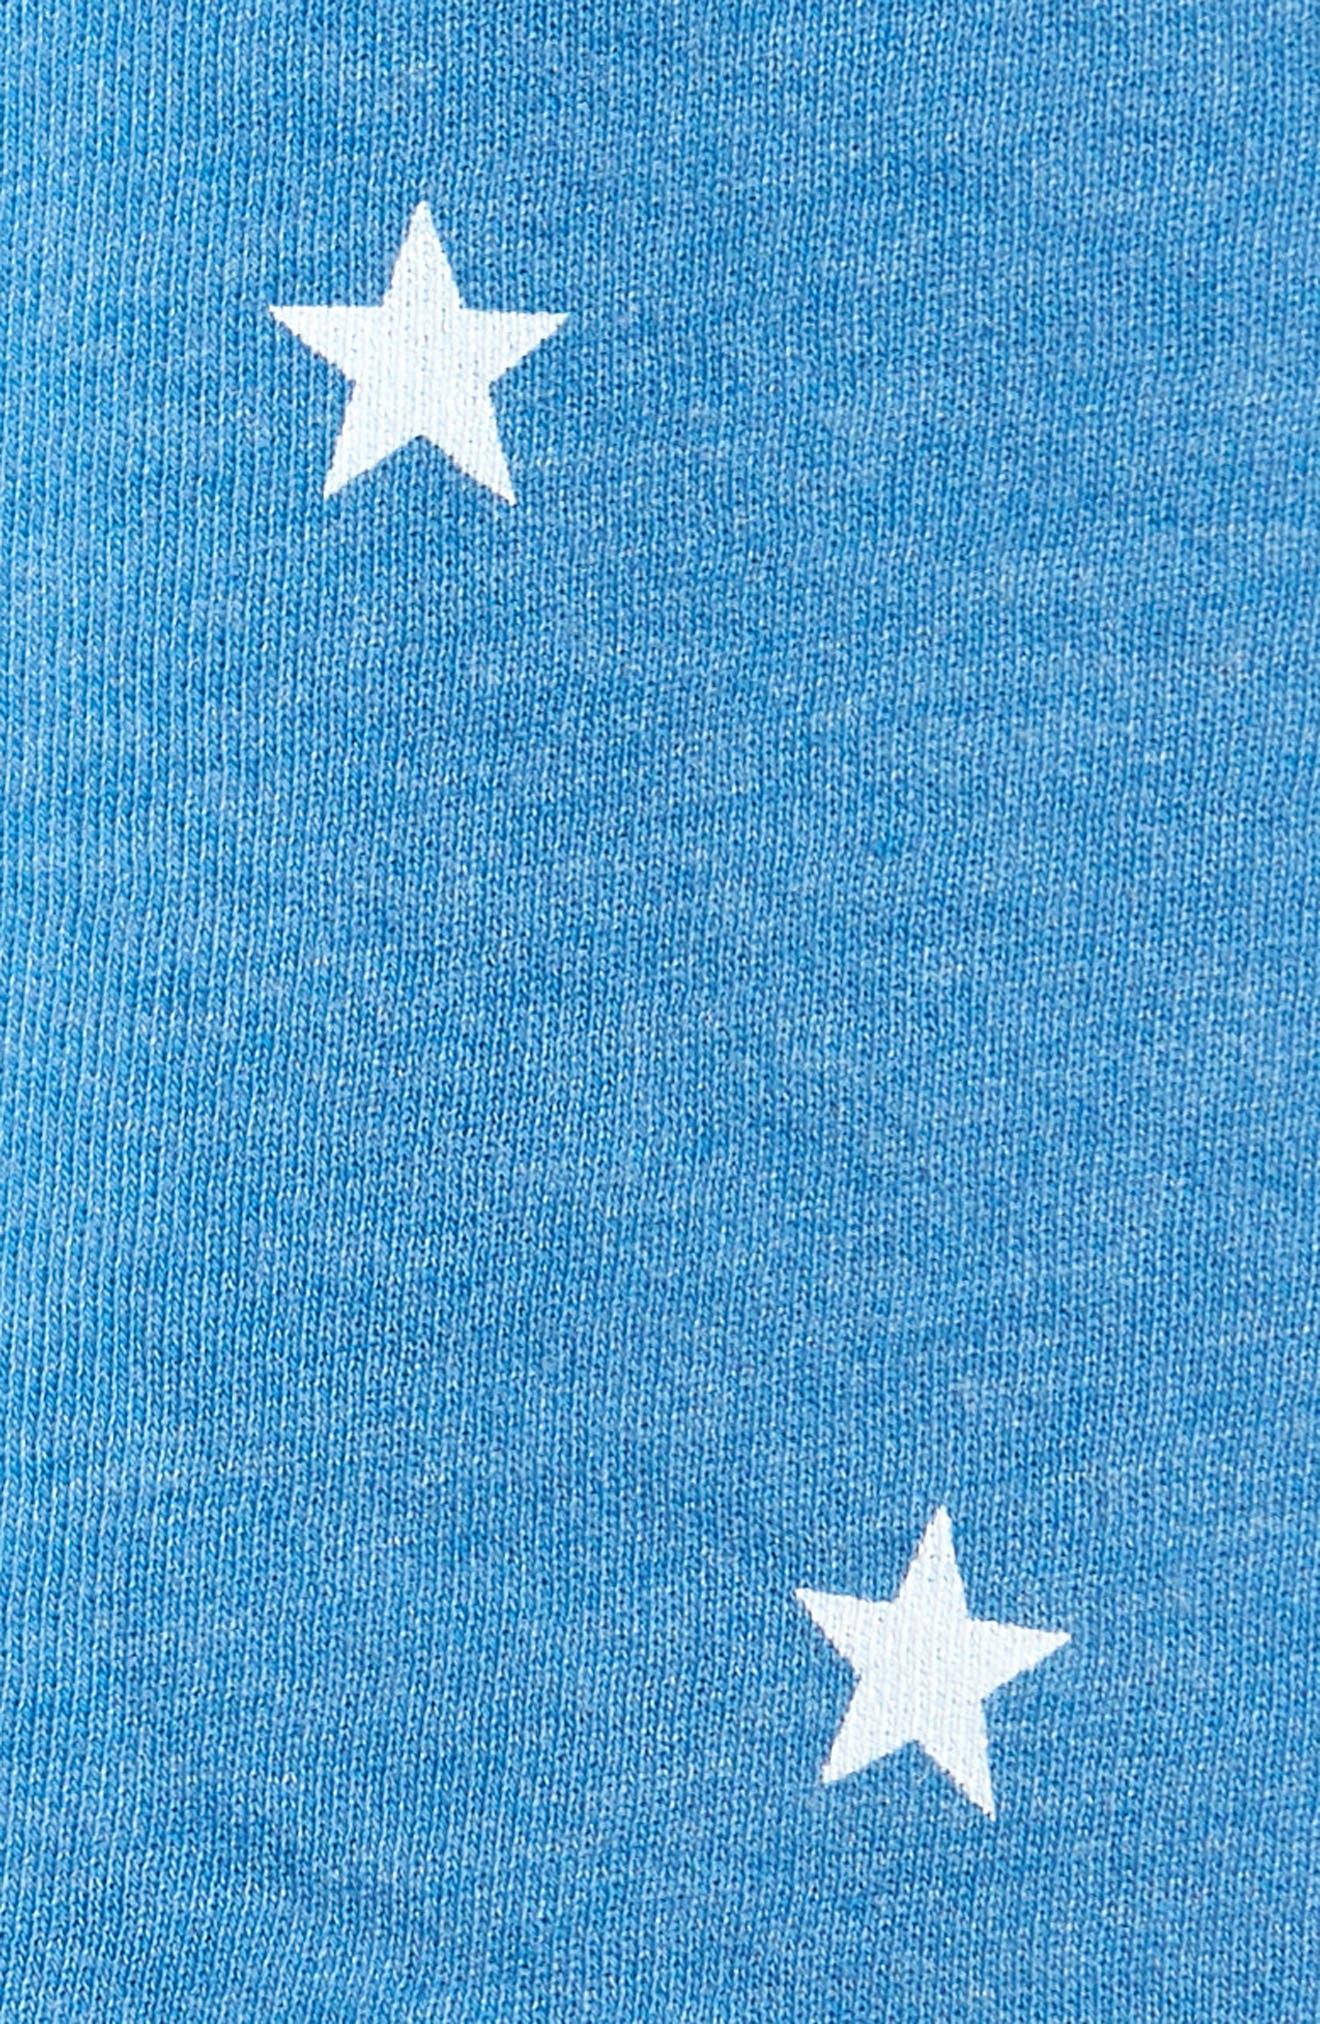 Football Star Hutton Hoodie,                             Alternate thumbnail 6, color,                             BLUE COAST